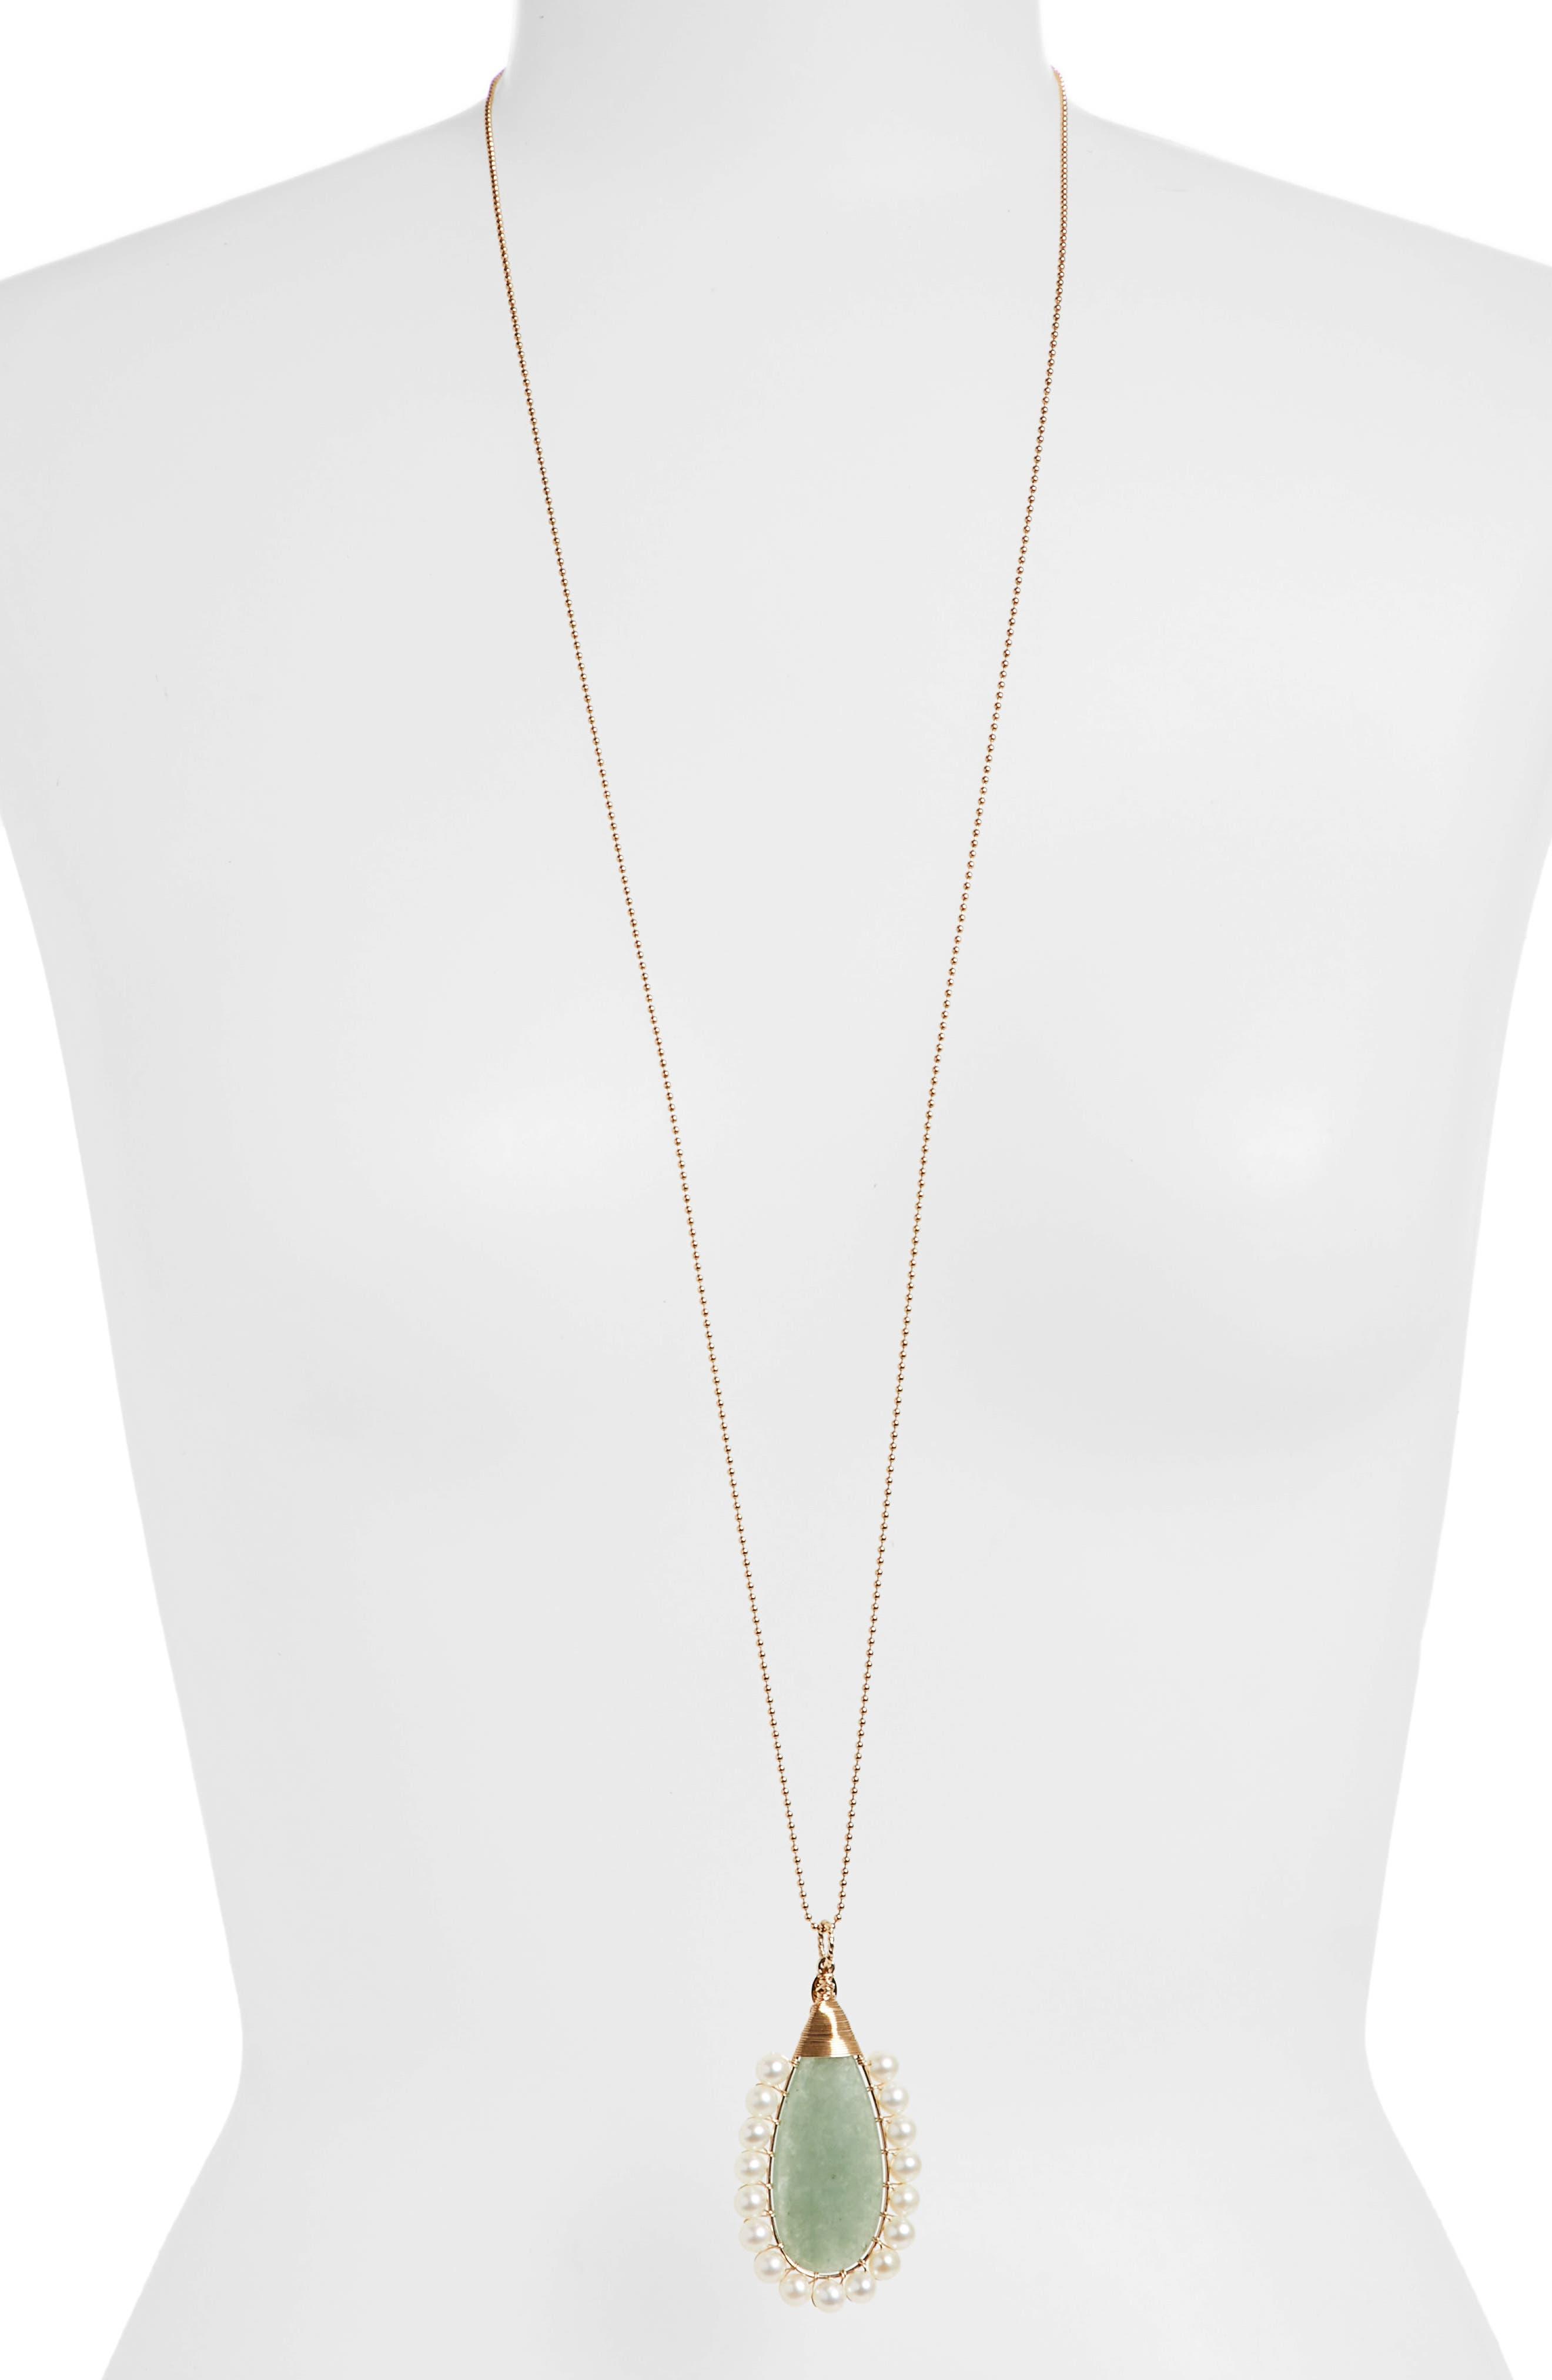 Lolita Green Aventurine & Freshwater Pearl Pendant Necklace,                             Alternate thumbnail 2, color,                             300